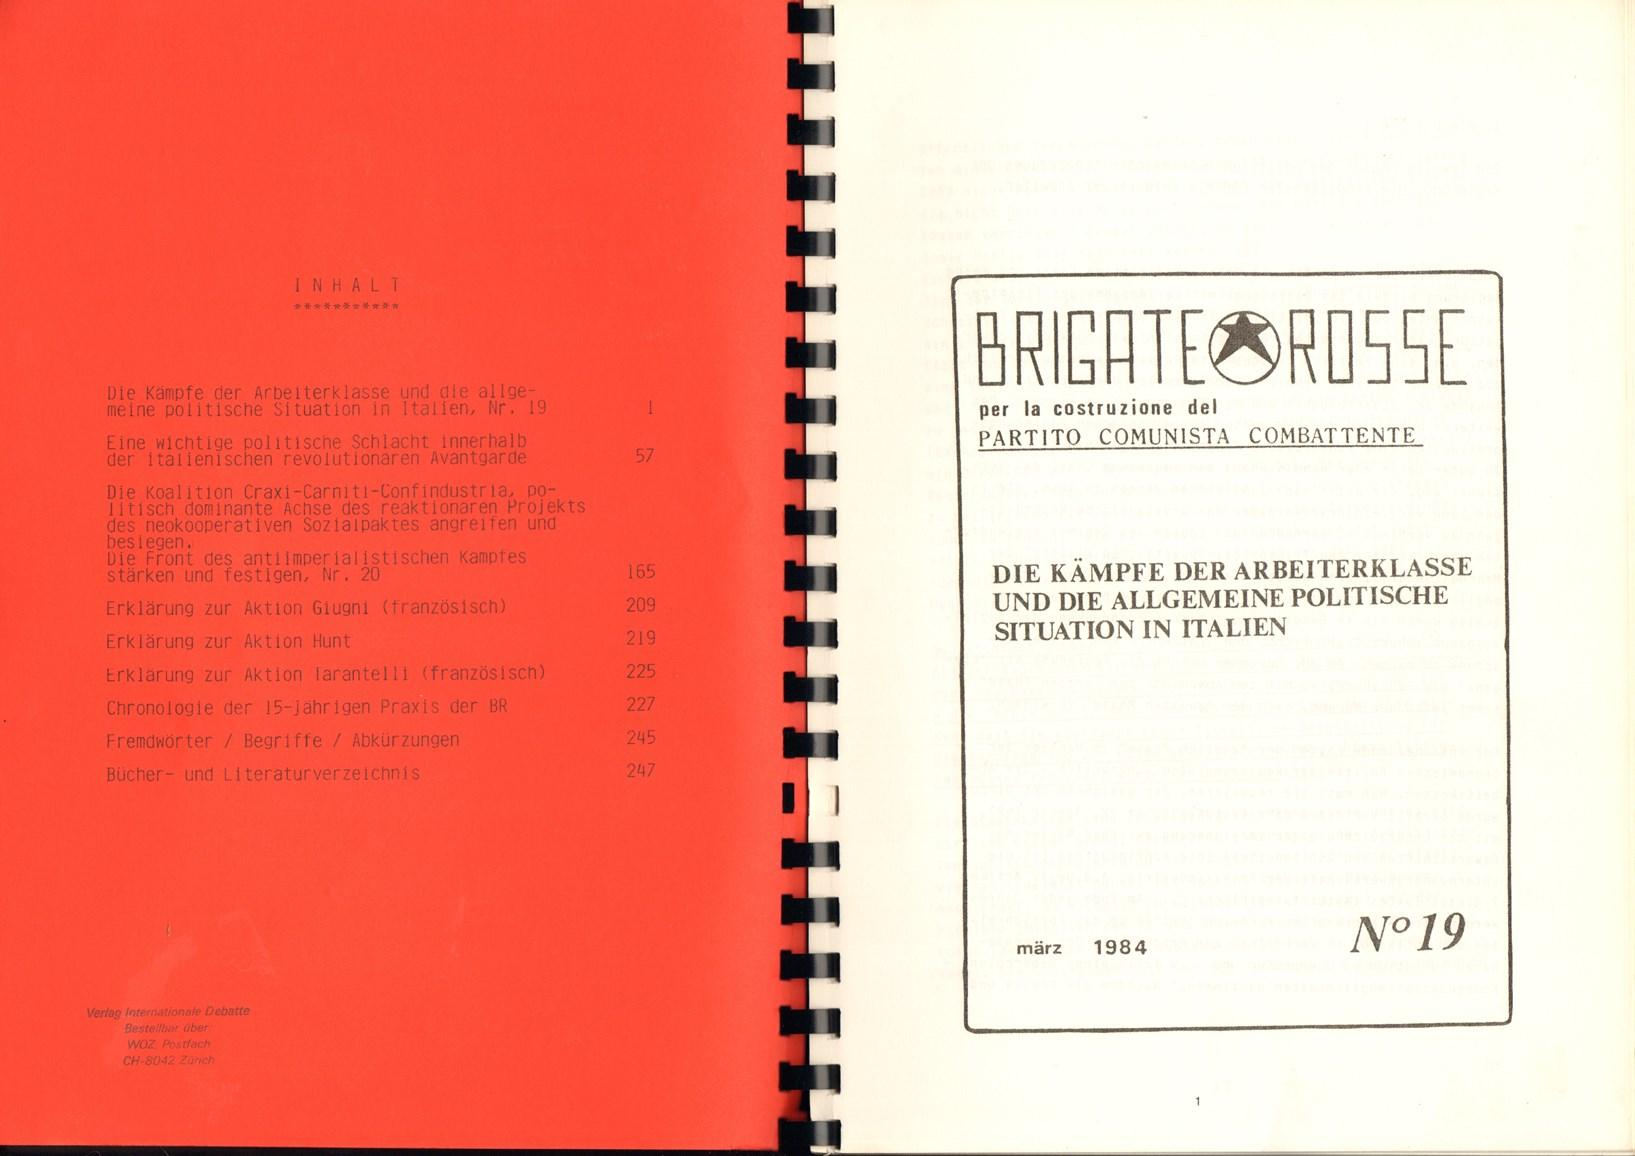 Internationale_Debatte_1985_Brigate_Rosse_002